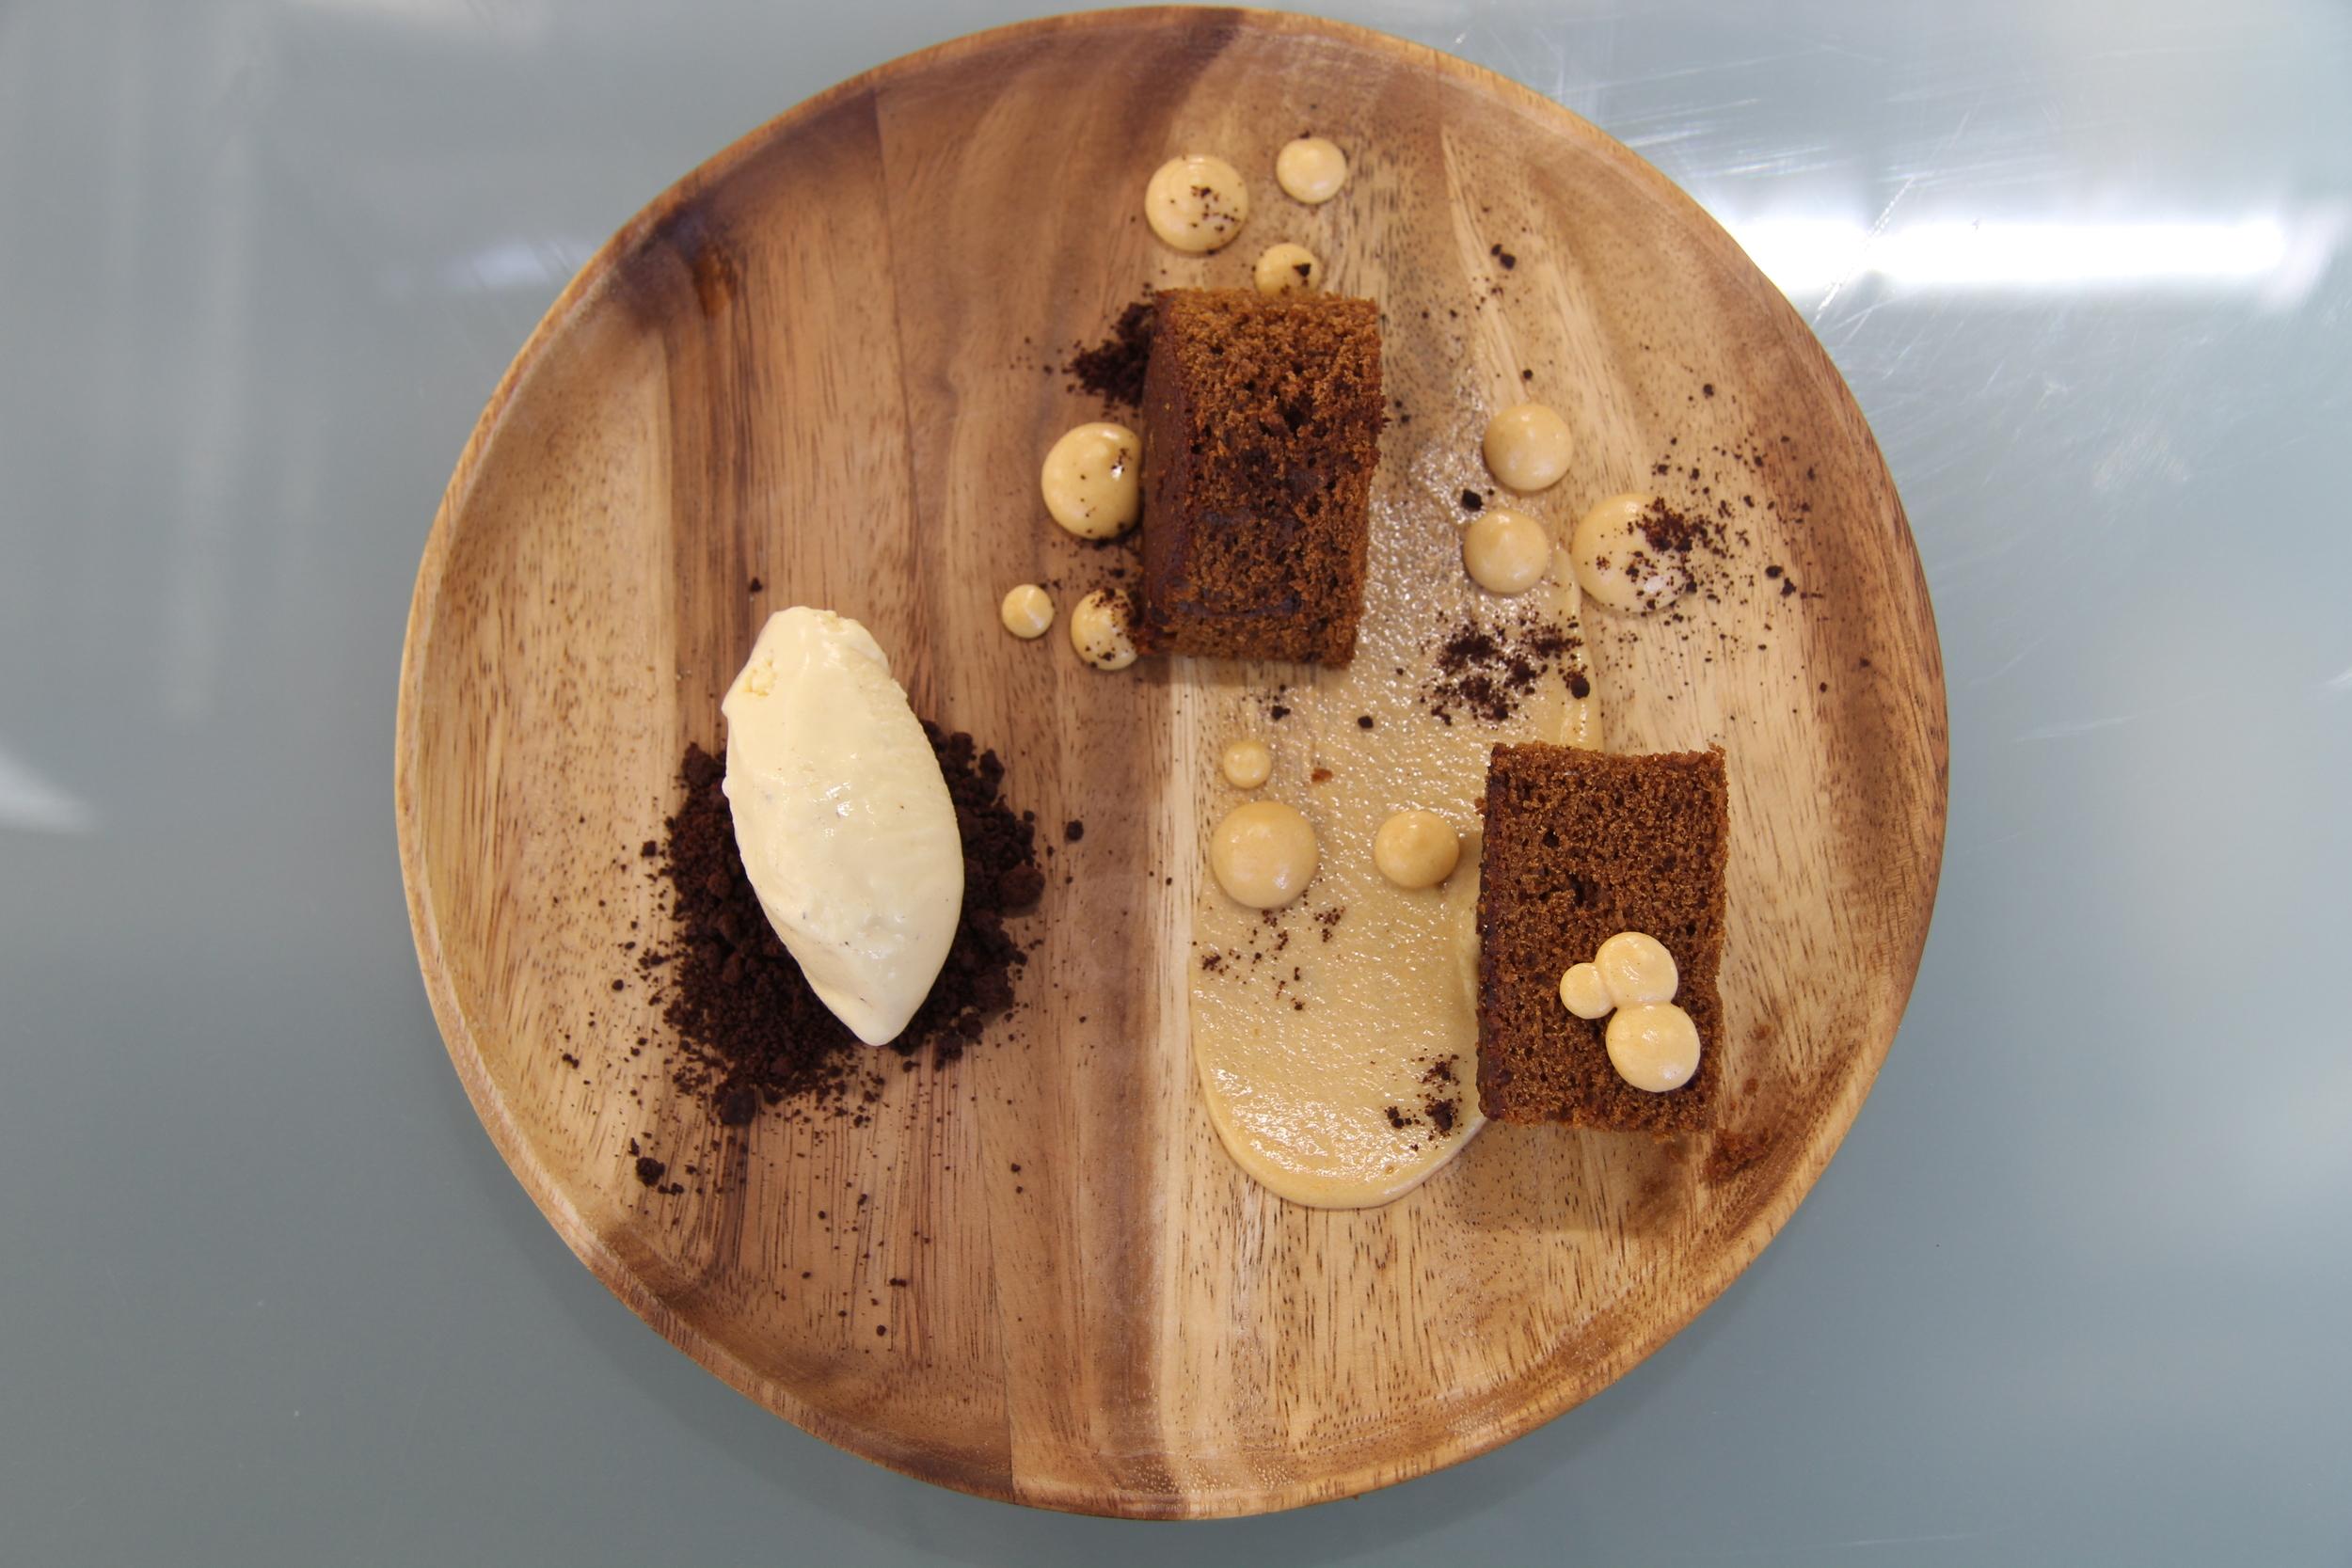 Gingerbread cake. Sweet Potato Custard. Chocolate Crumble. Nutmeg Ice Cream.